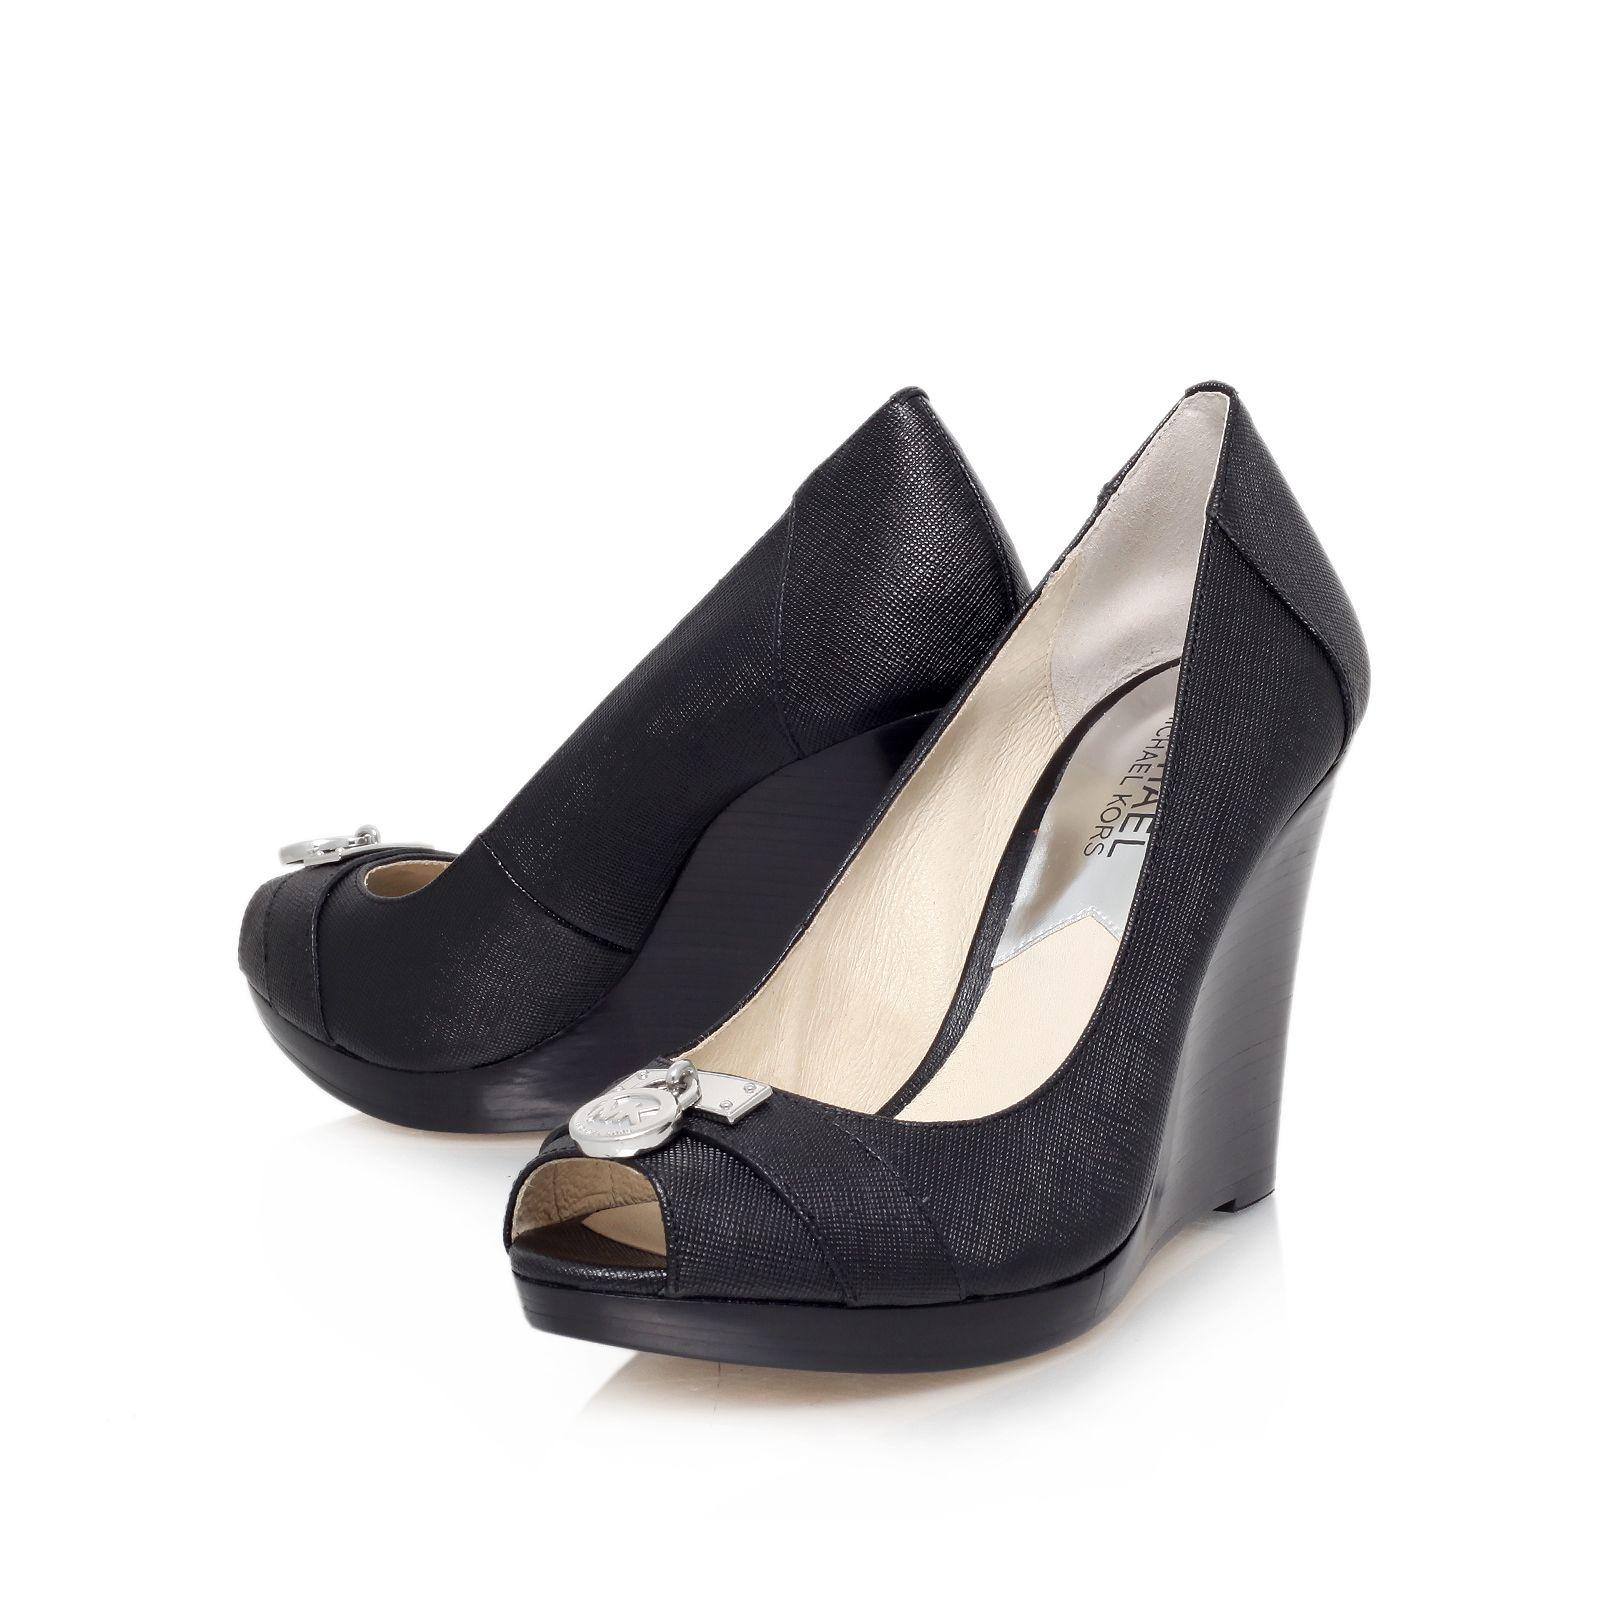 michael kors hamilton wedge peep toe court shoes in black